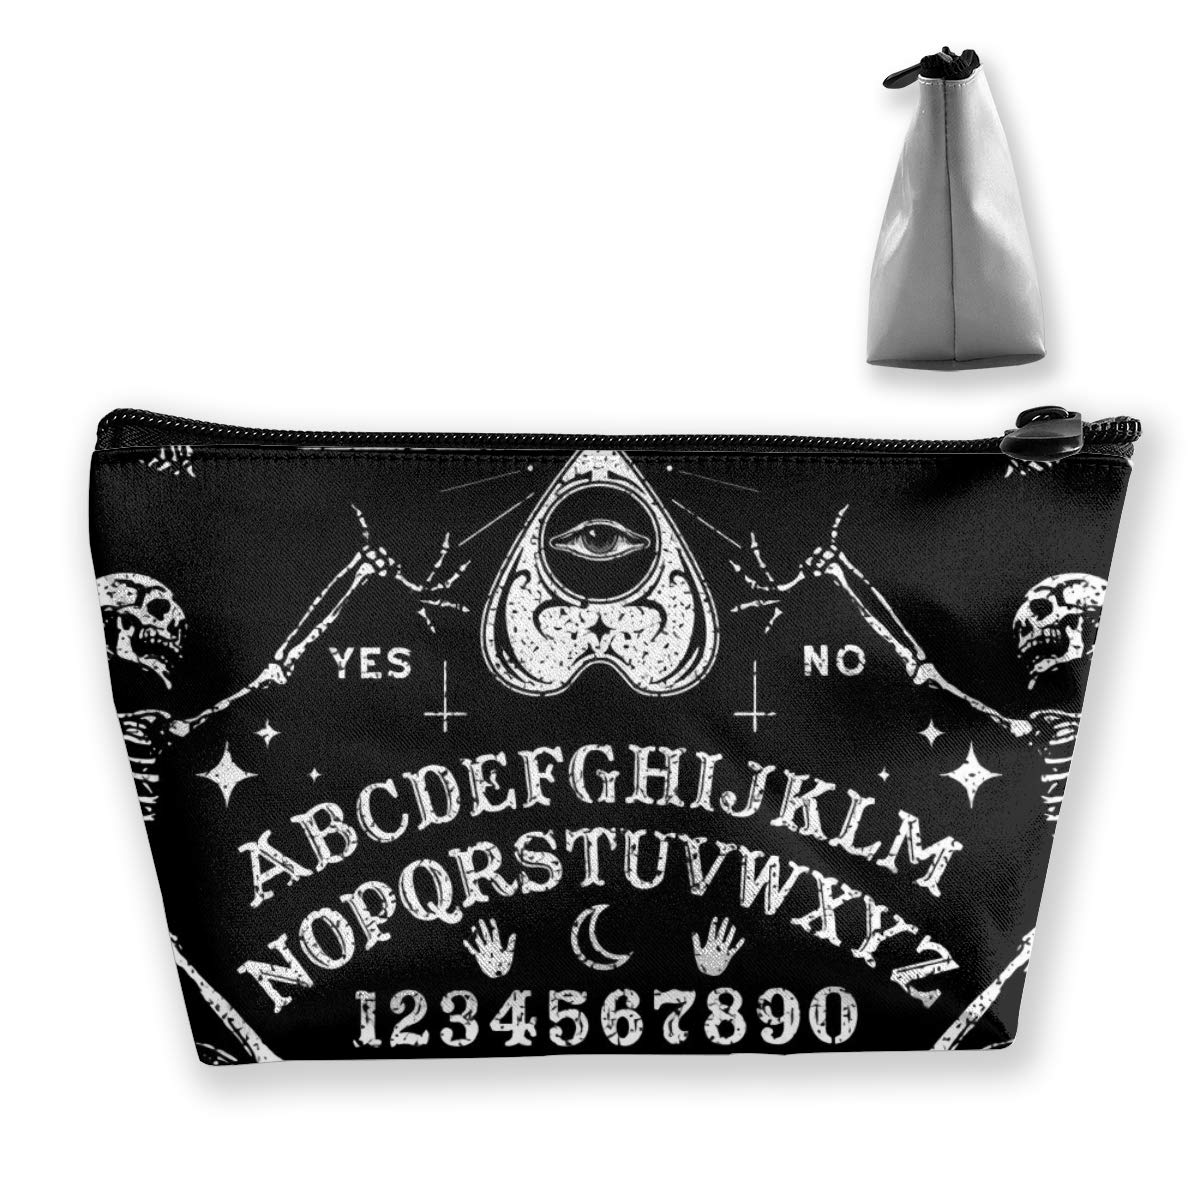 Women Vintage Skeleton Magic Ouija Board Black Make Up Bag Organizer Multi-Purpose Cosmetic Train Case Fashion Zipper Tote Bag Large Capacity for Cosmetics Jewelry Trip